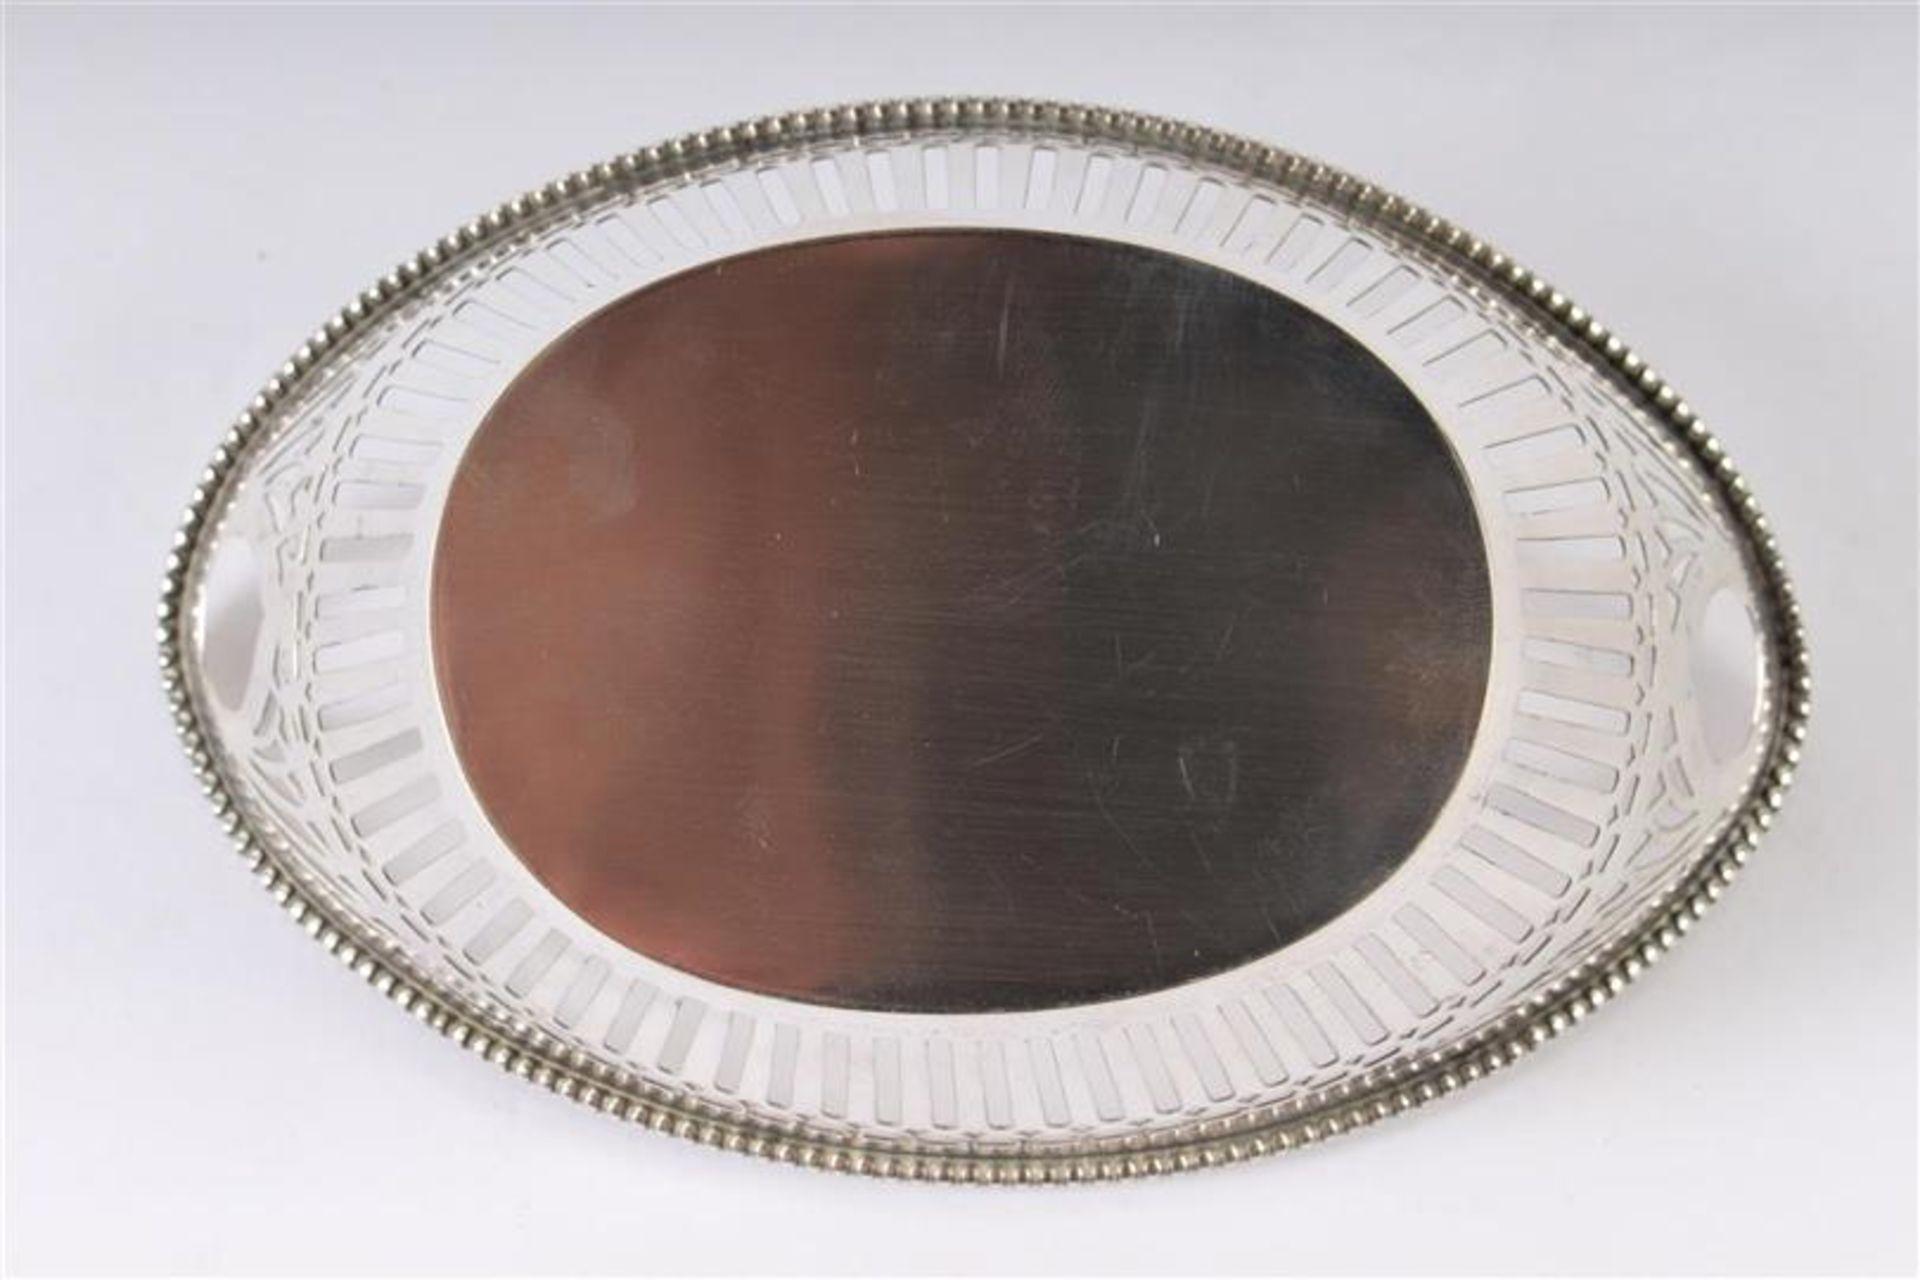 Los 38 - Zilveren bonbonmandje ajour met parelrand, Hollands gekeurd. B: 15 cm.